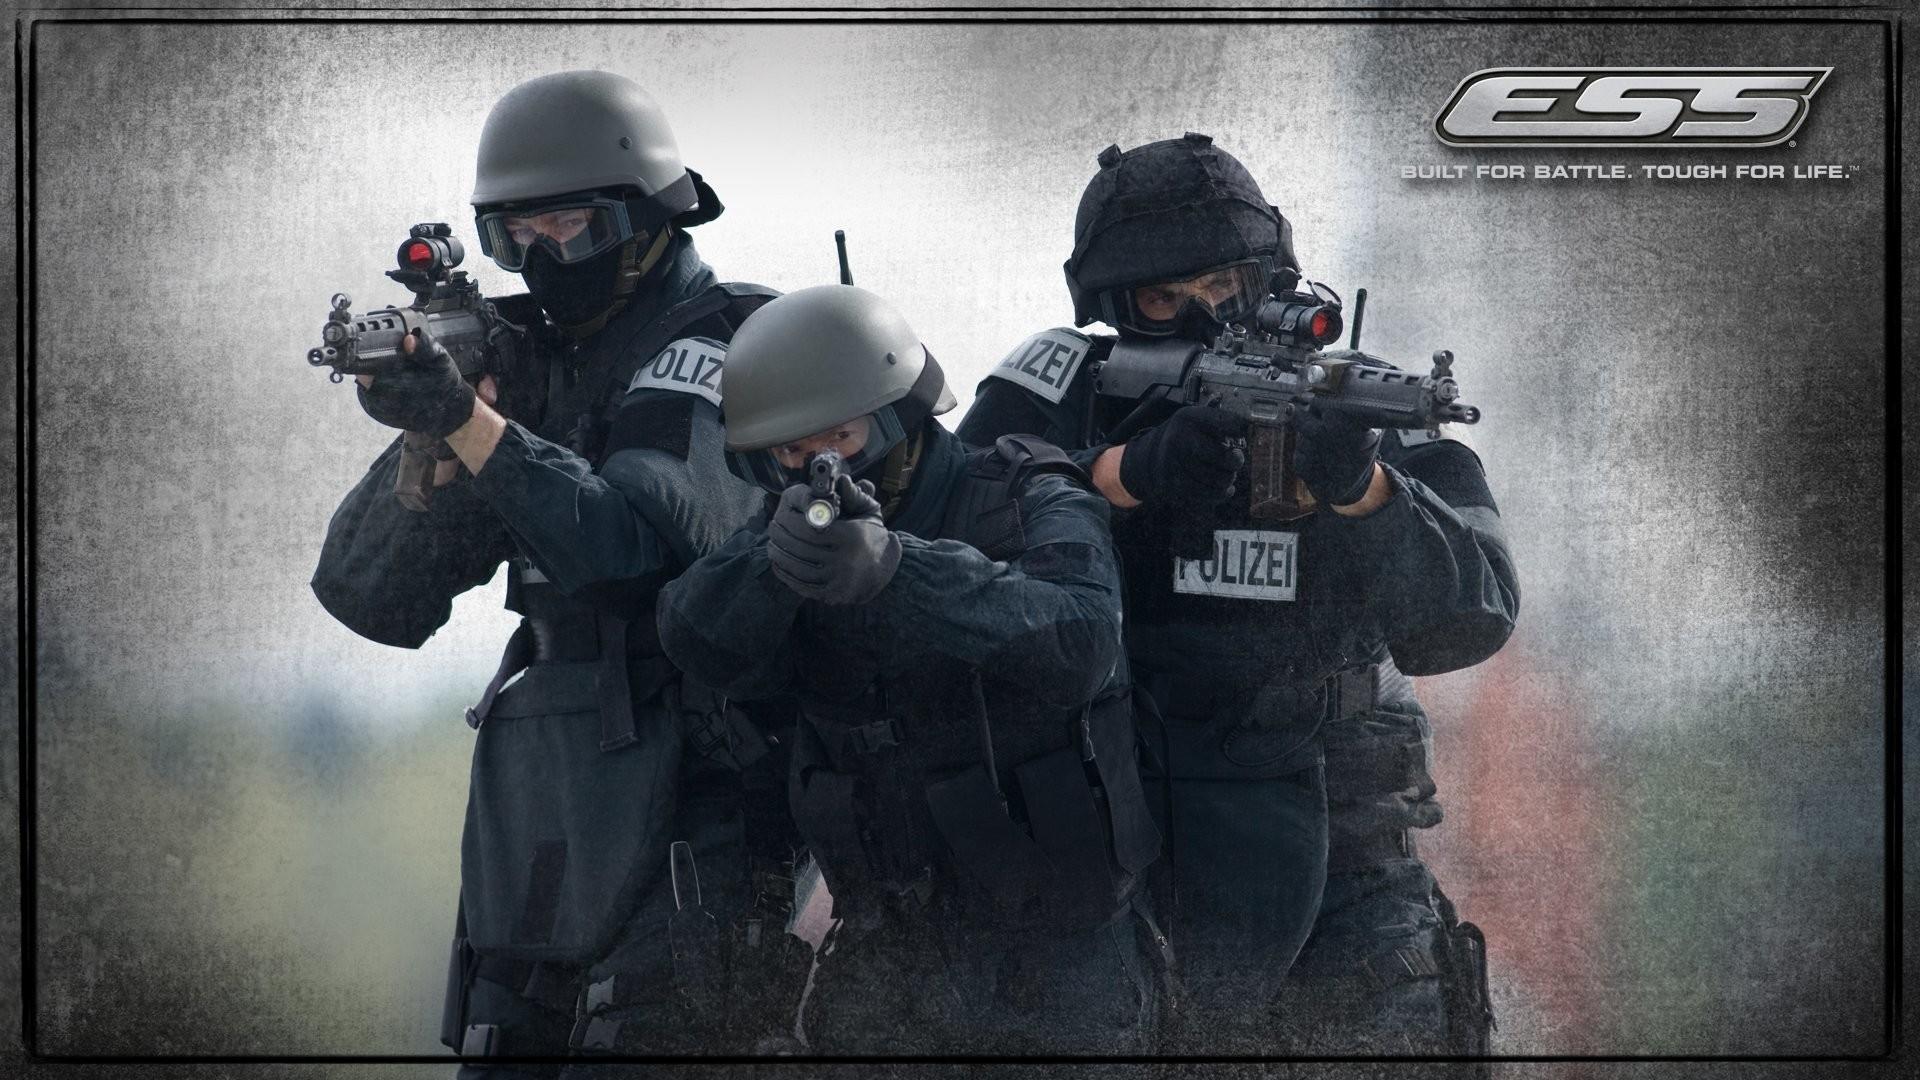 Download Wallpaper Swat Hd 371616 Hd Wallpaper